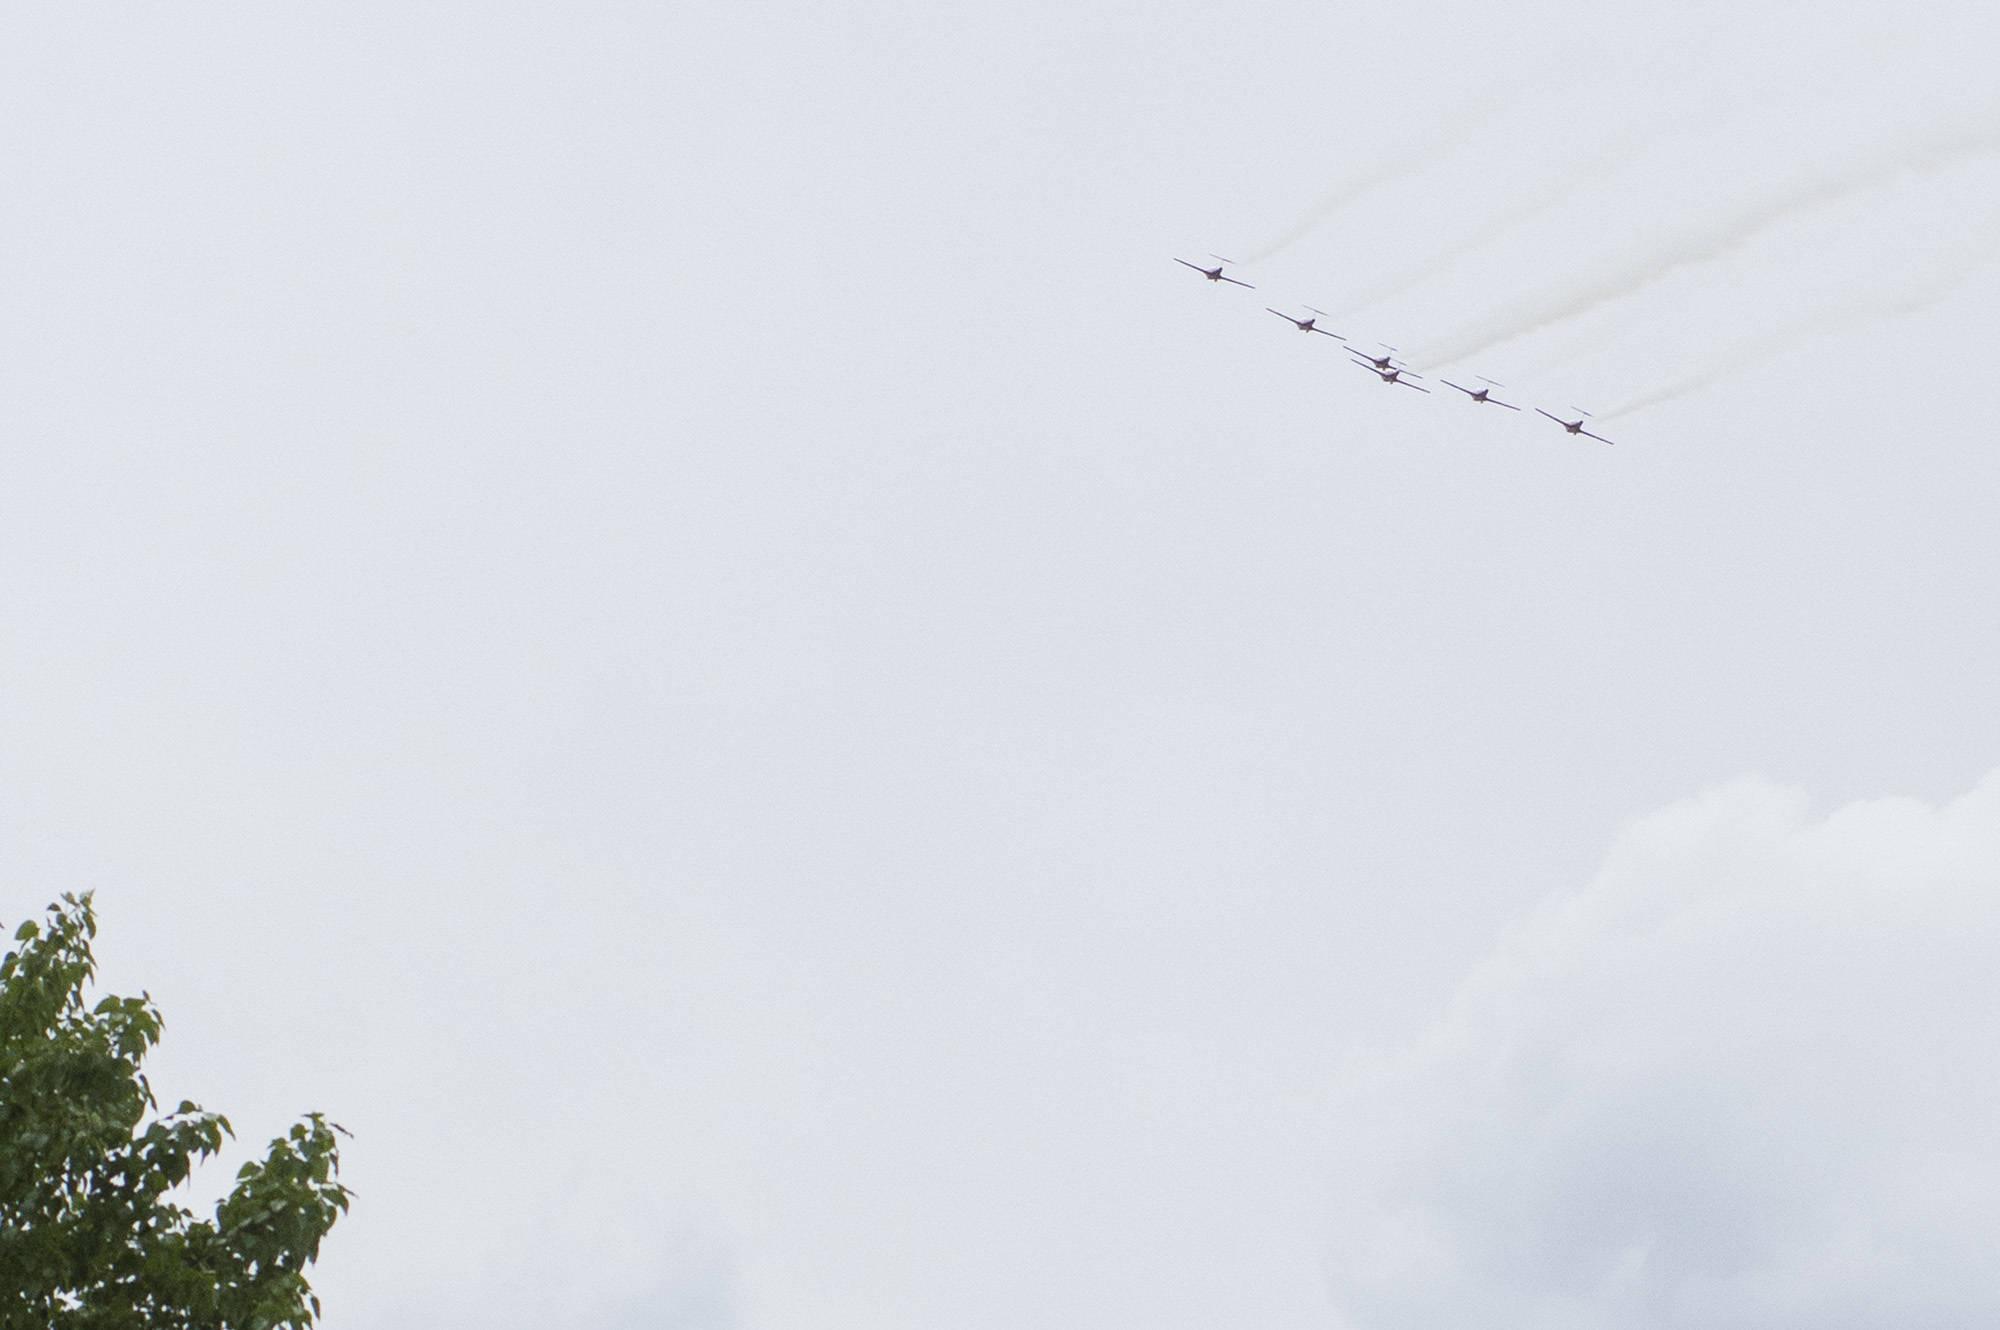 The Snowbirds fly over Salmon Arm on Saturday, May 16. (Jim Elliot/Salmon Arm Observer)